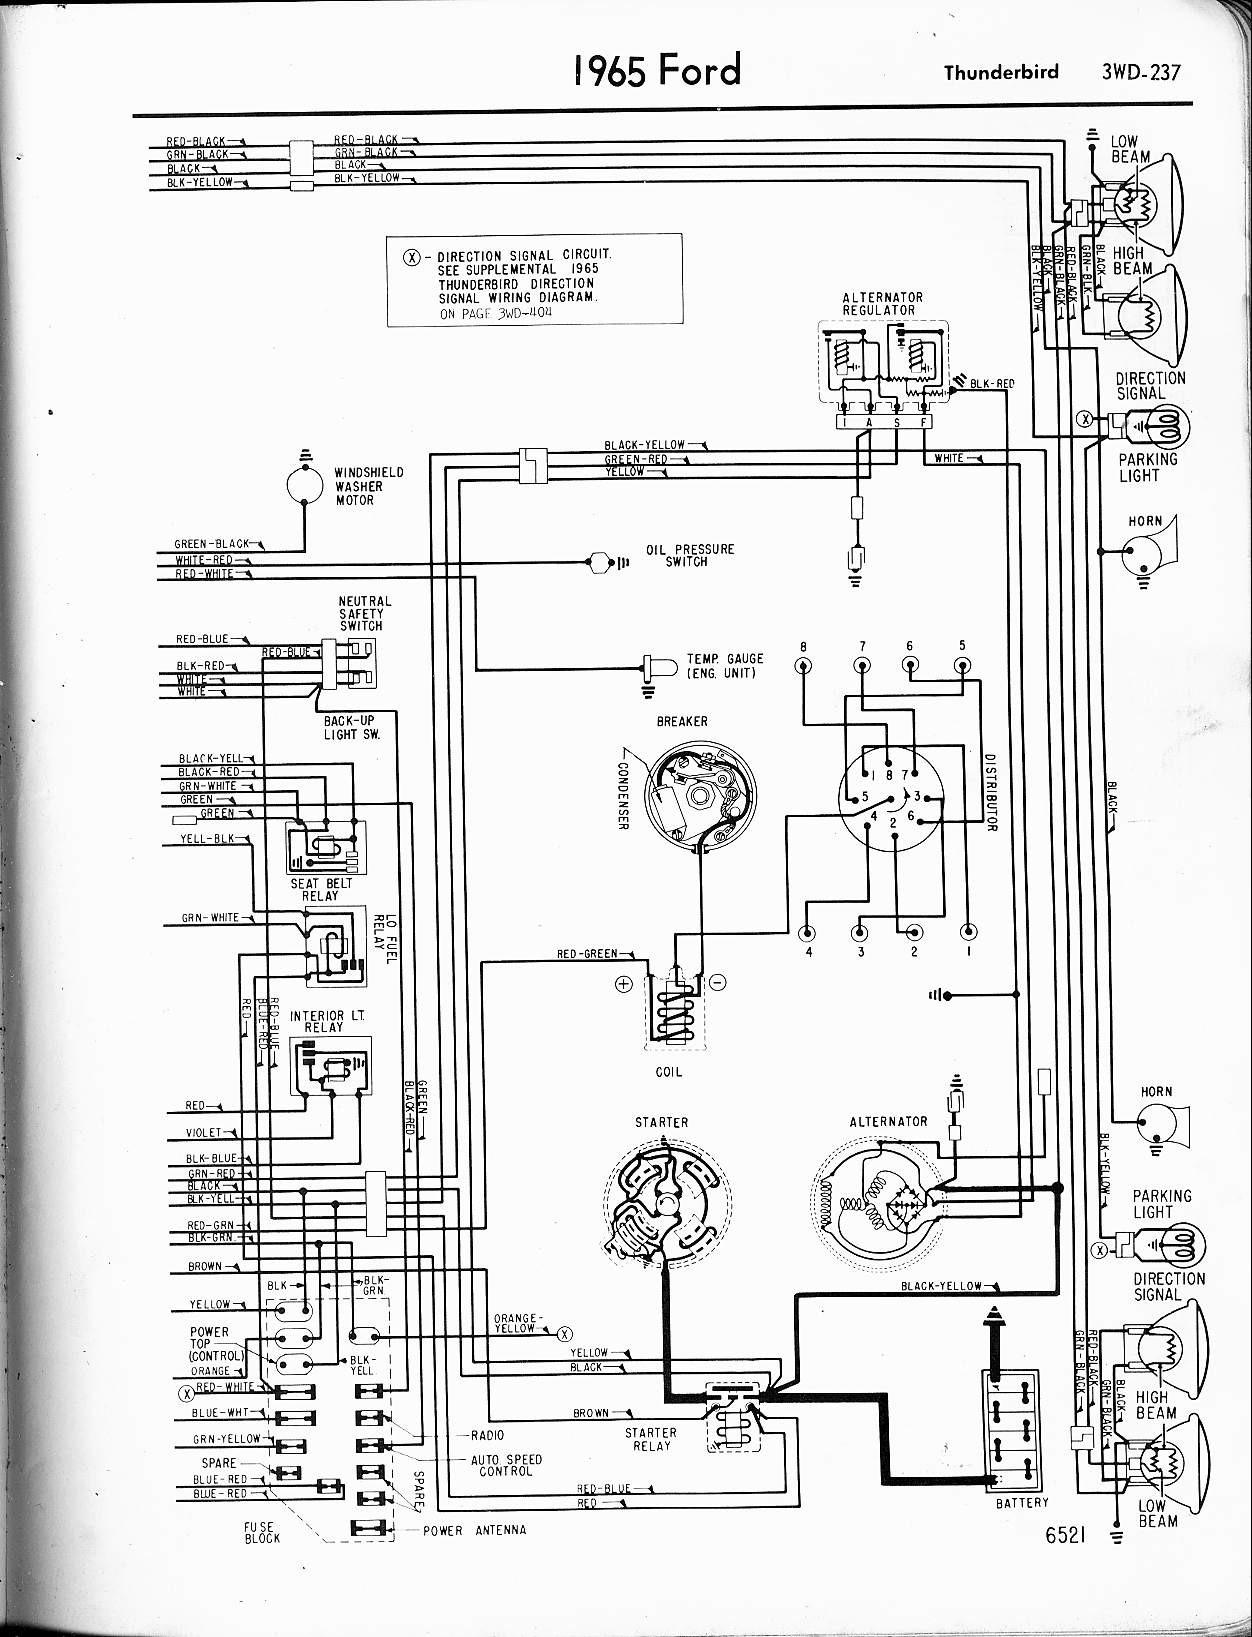 65 F100 Wiring Diagram Diy Enthusiasts Diagrams 1970 Ford Ba Falcon Engine Parts My Rh Detoxicrecenze Com